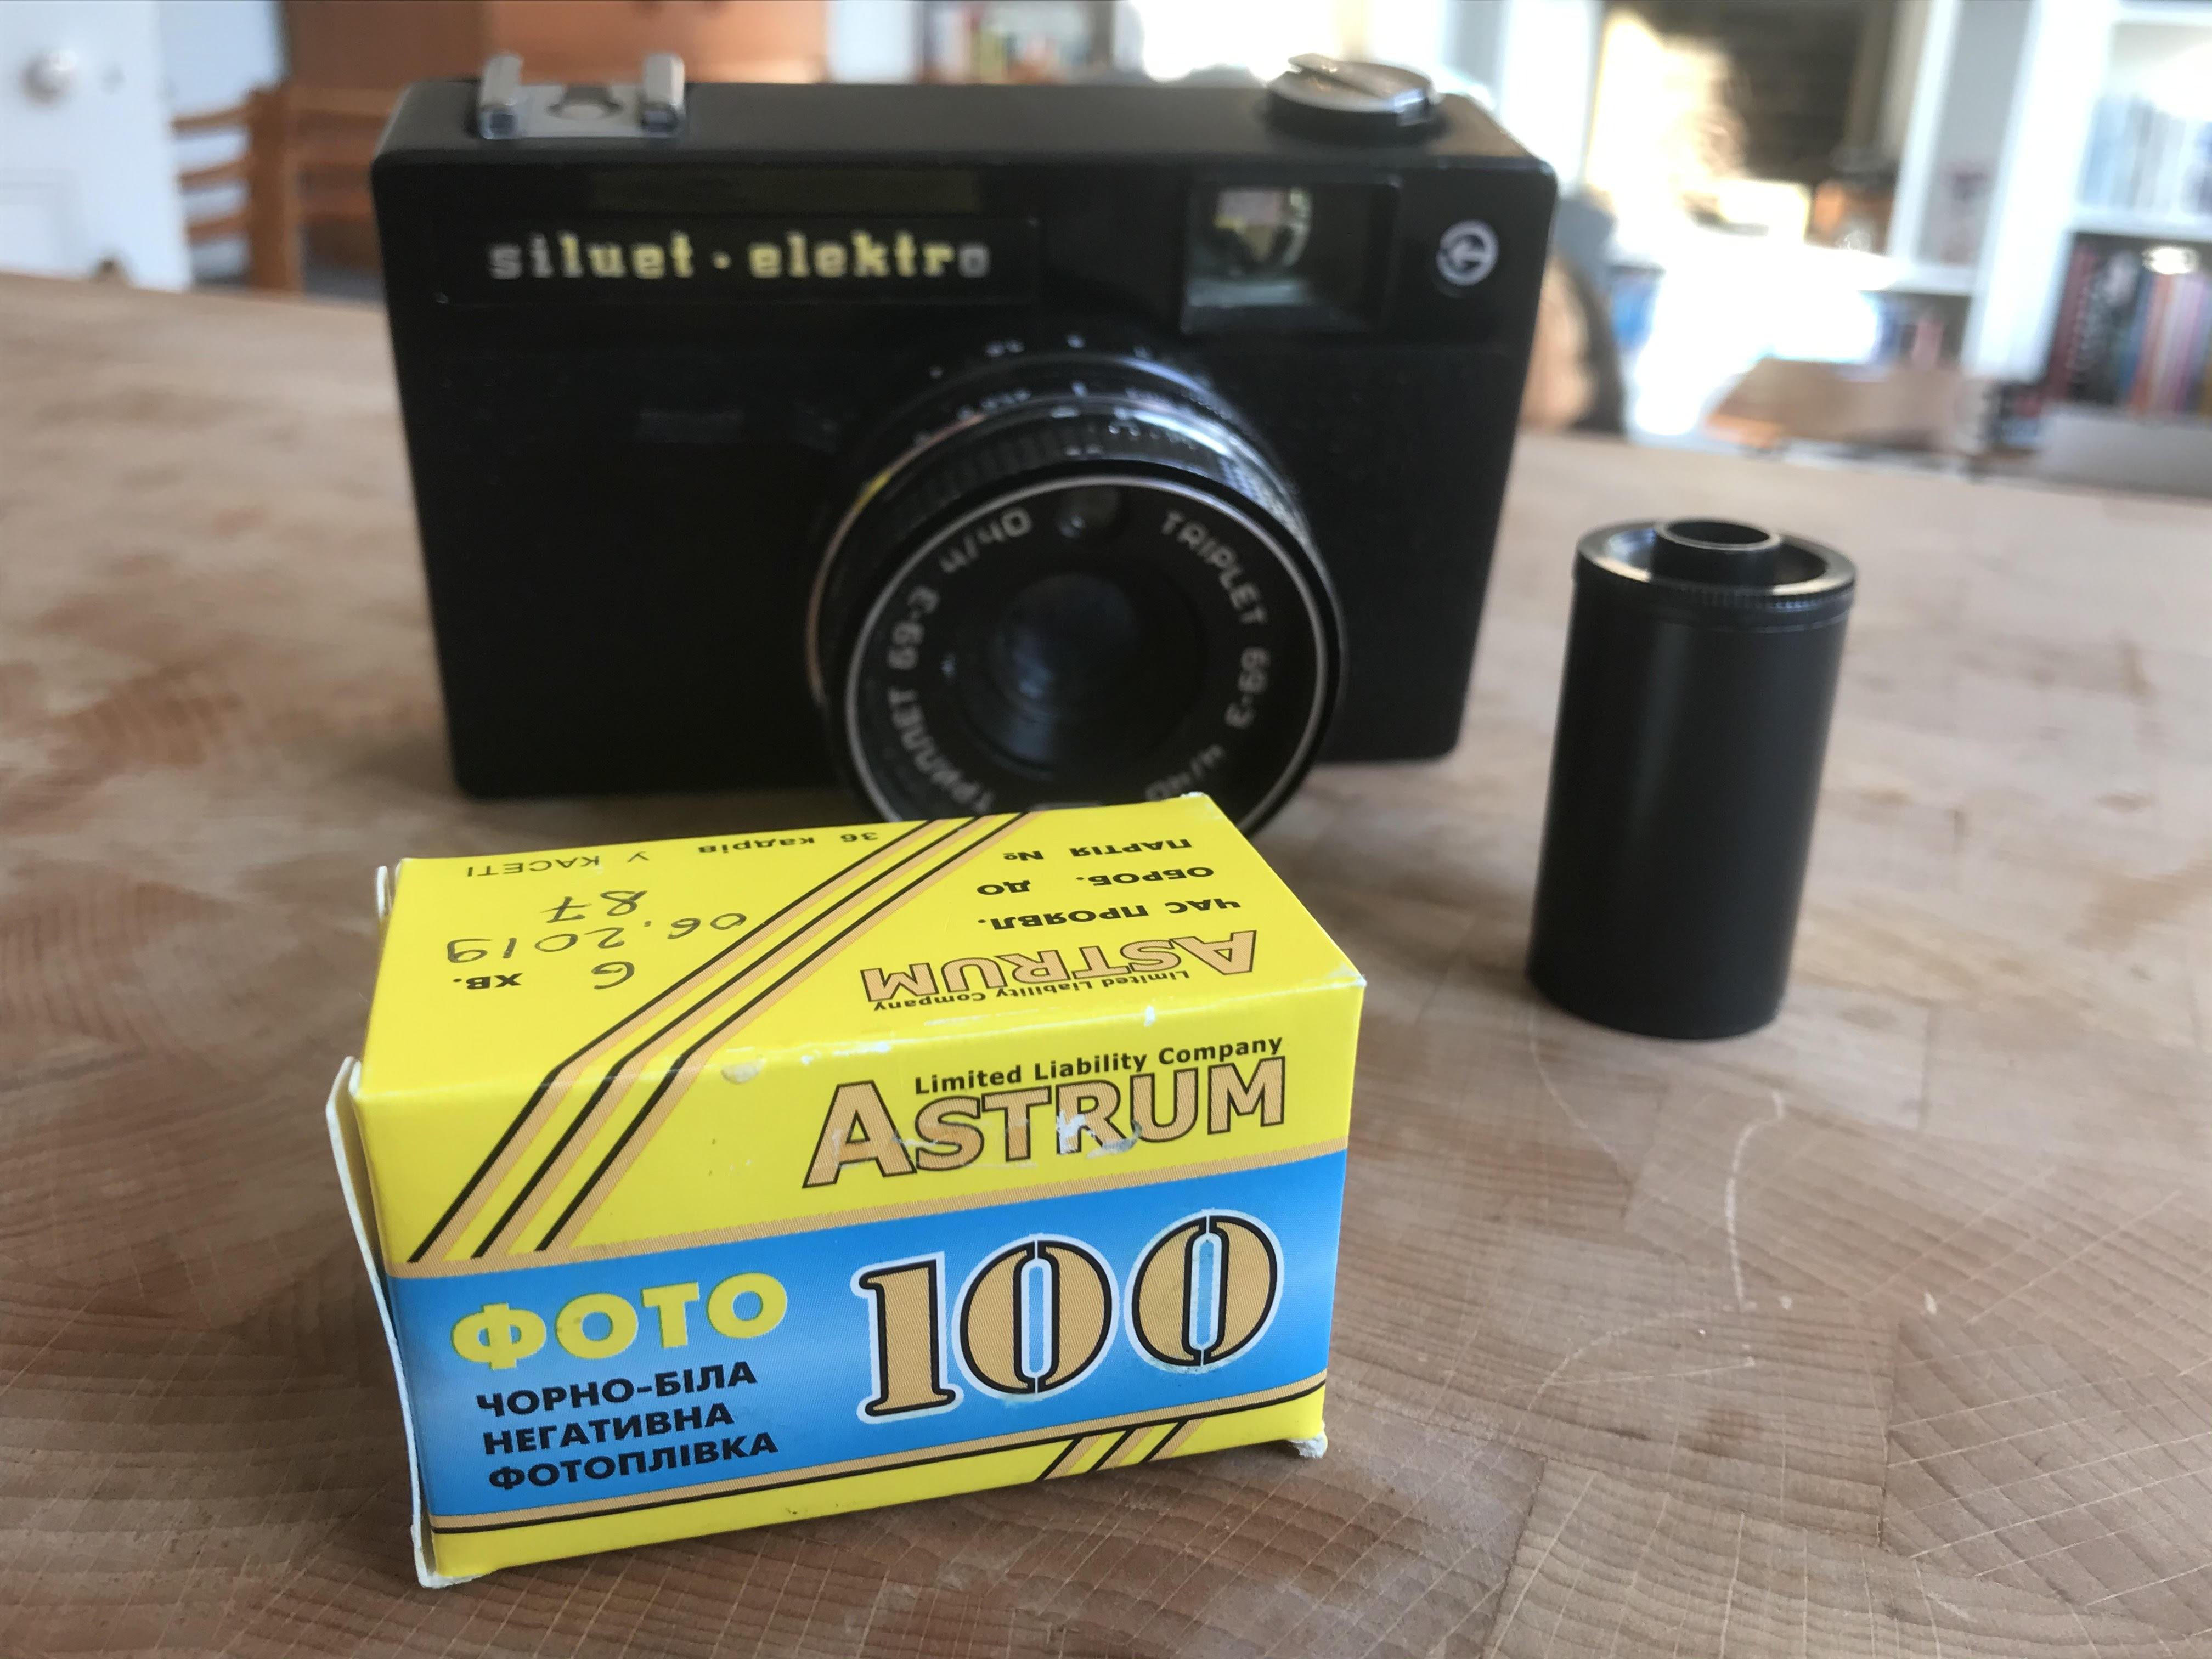 Astrum Foto 100 (Pic: Stephen Dowling)